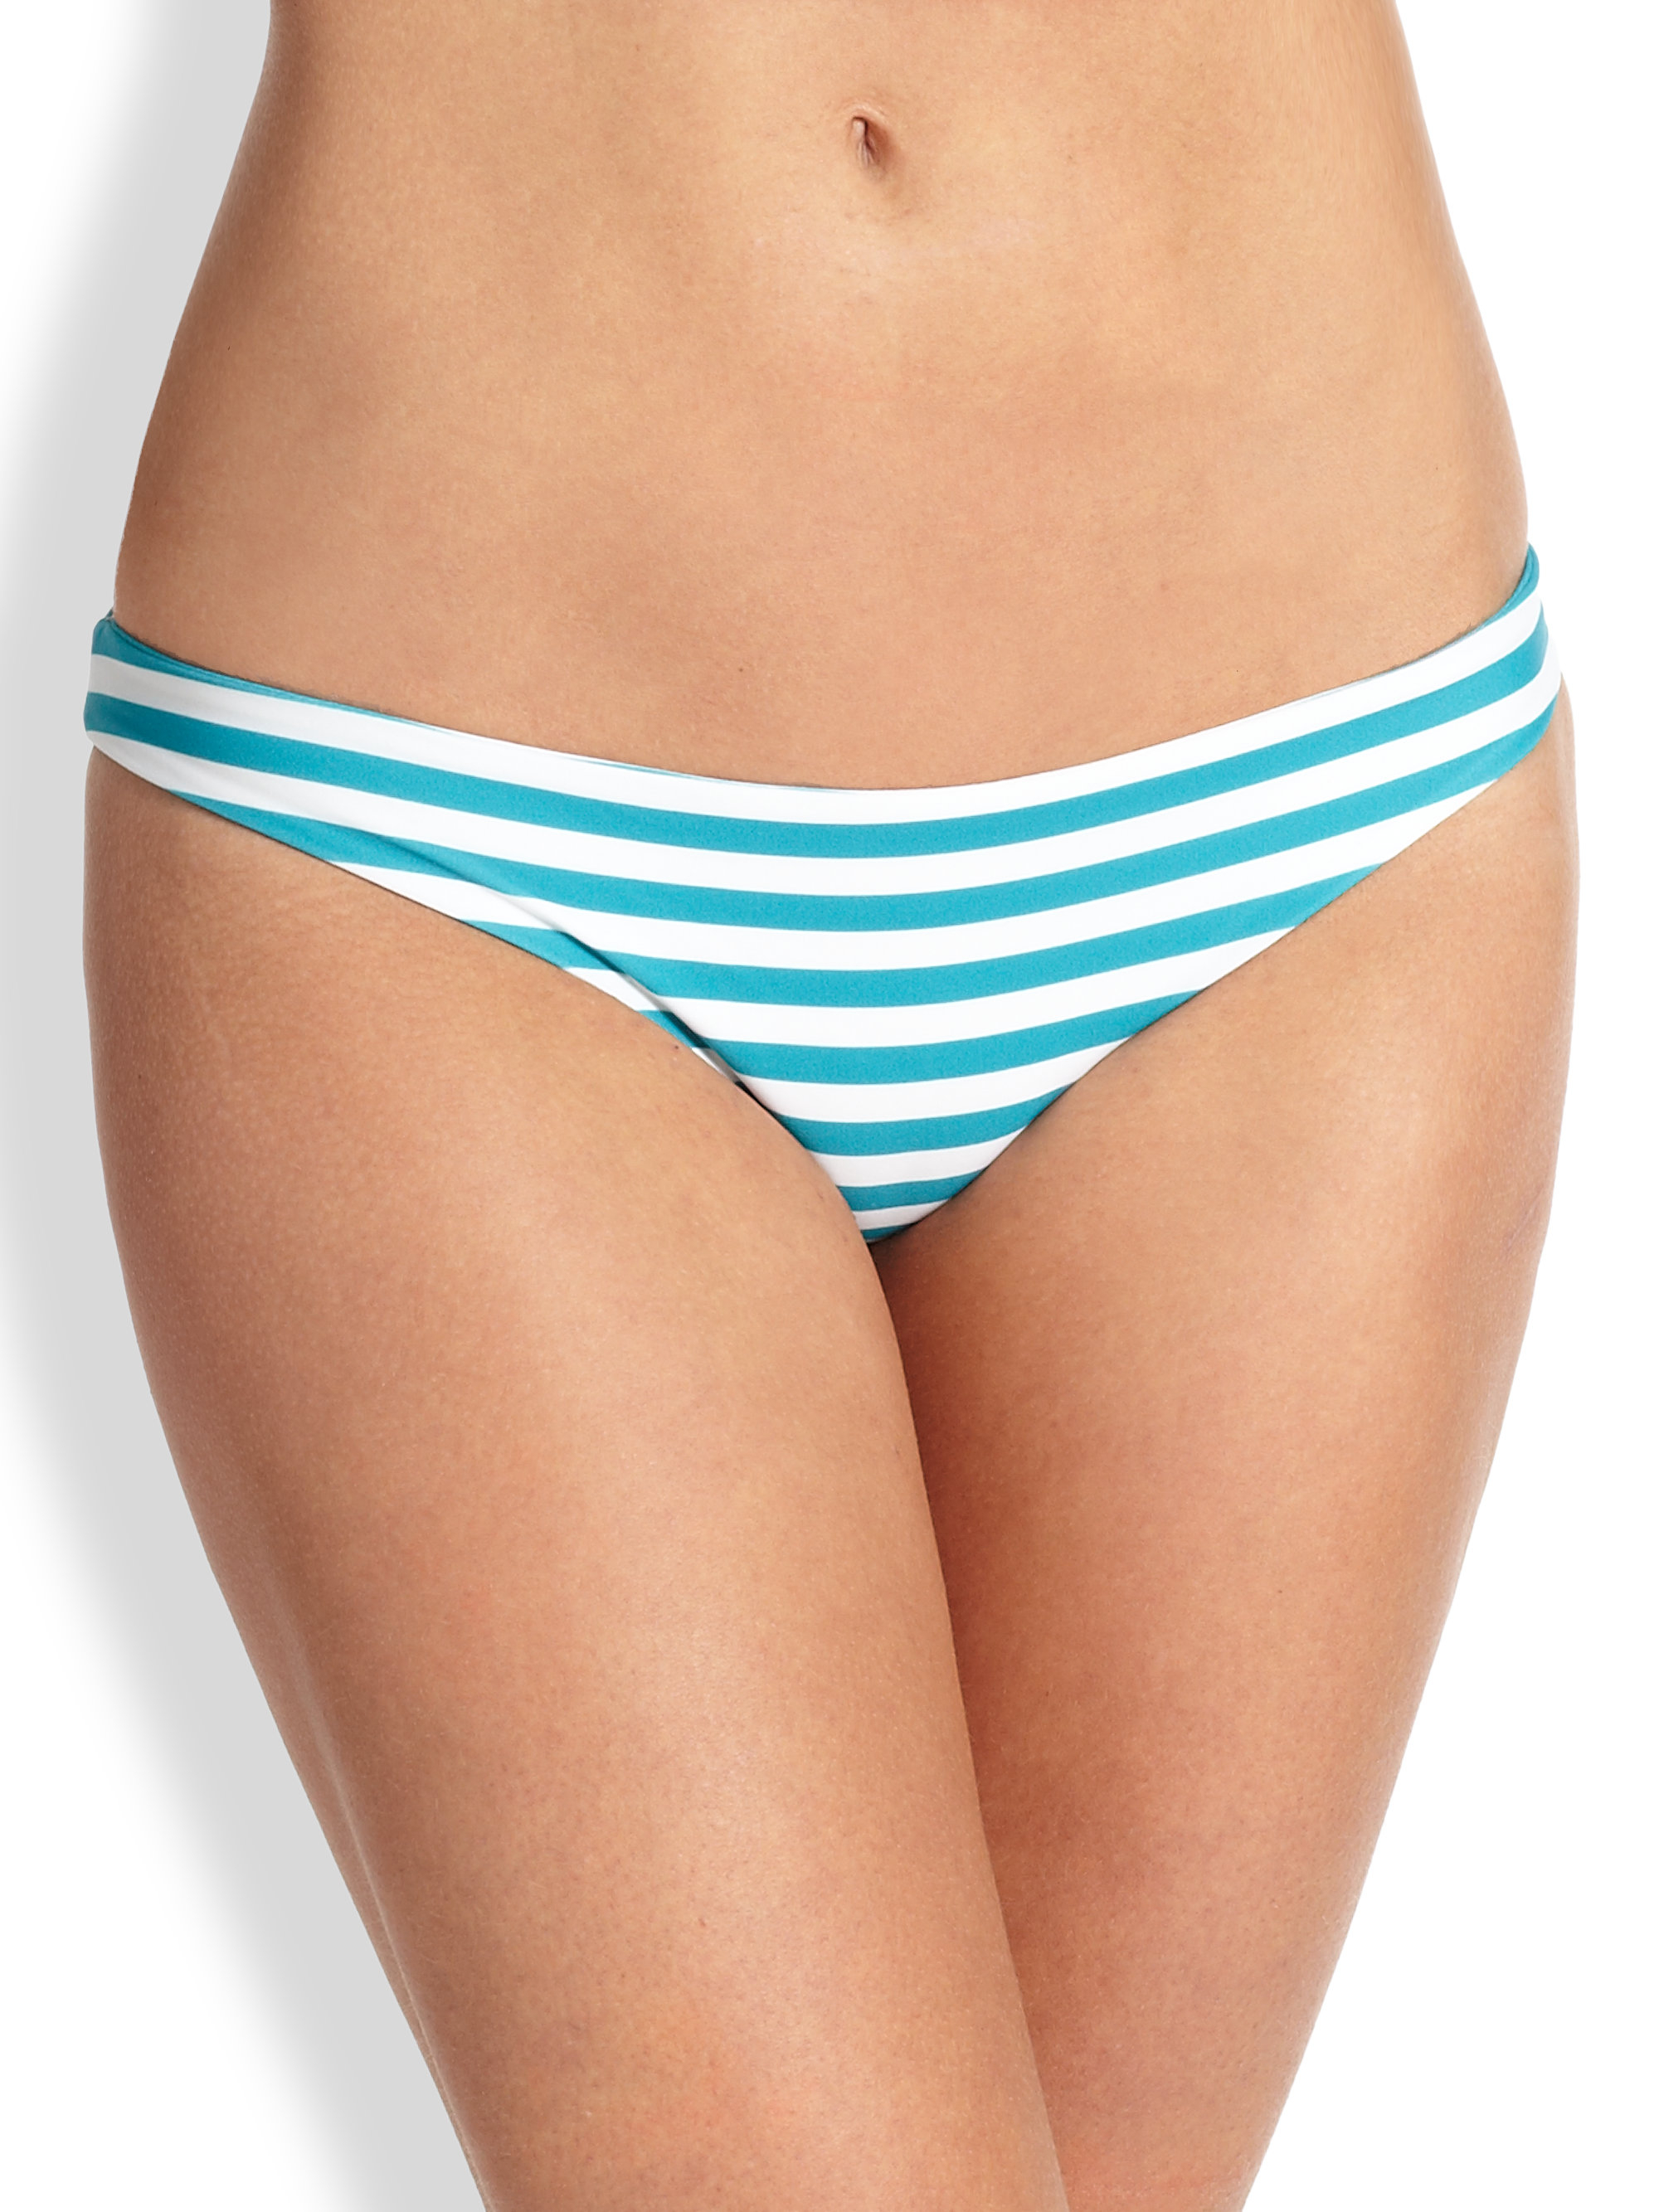 Fav milf Full coverage string bikini why the